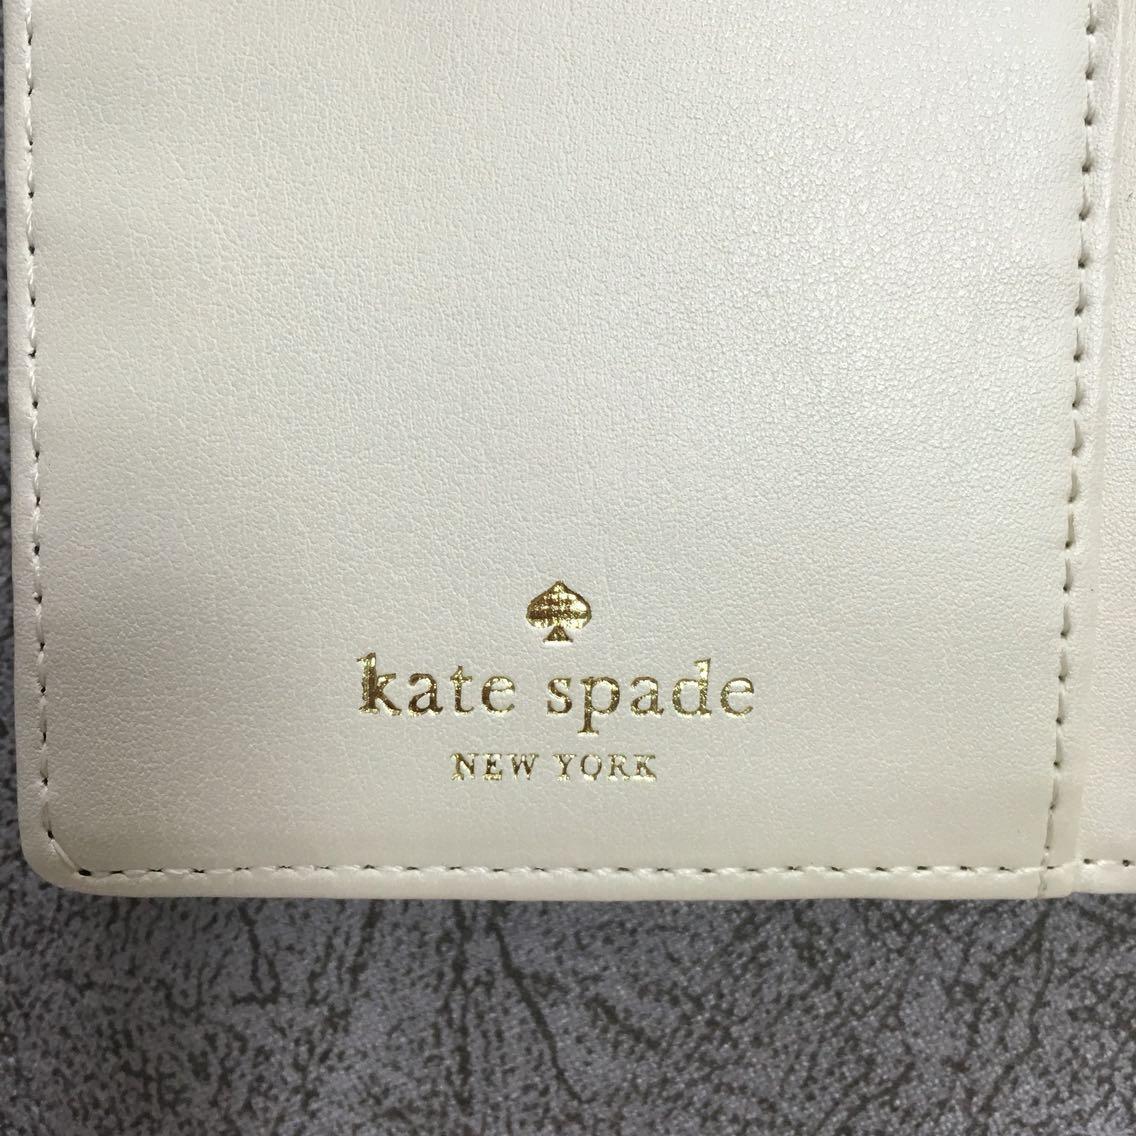 Kate Spade凯特·丝蓓钱包